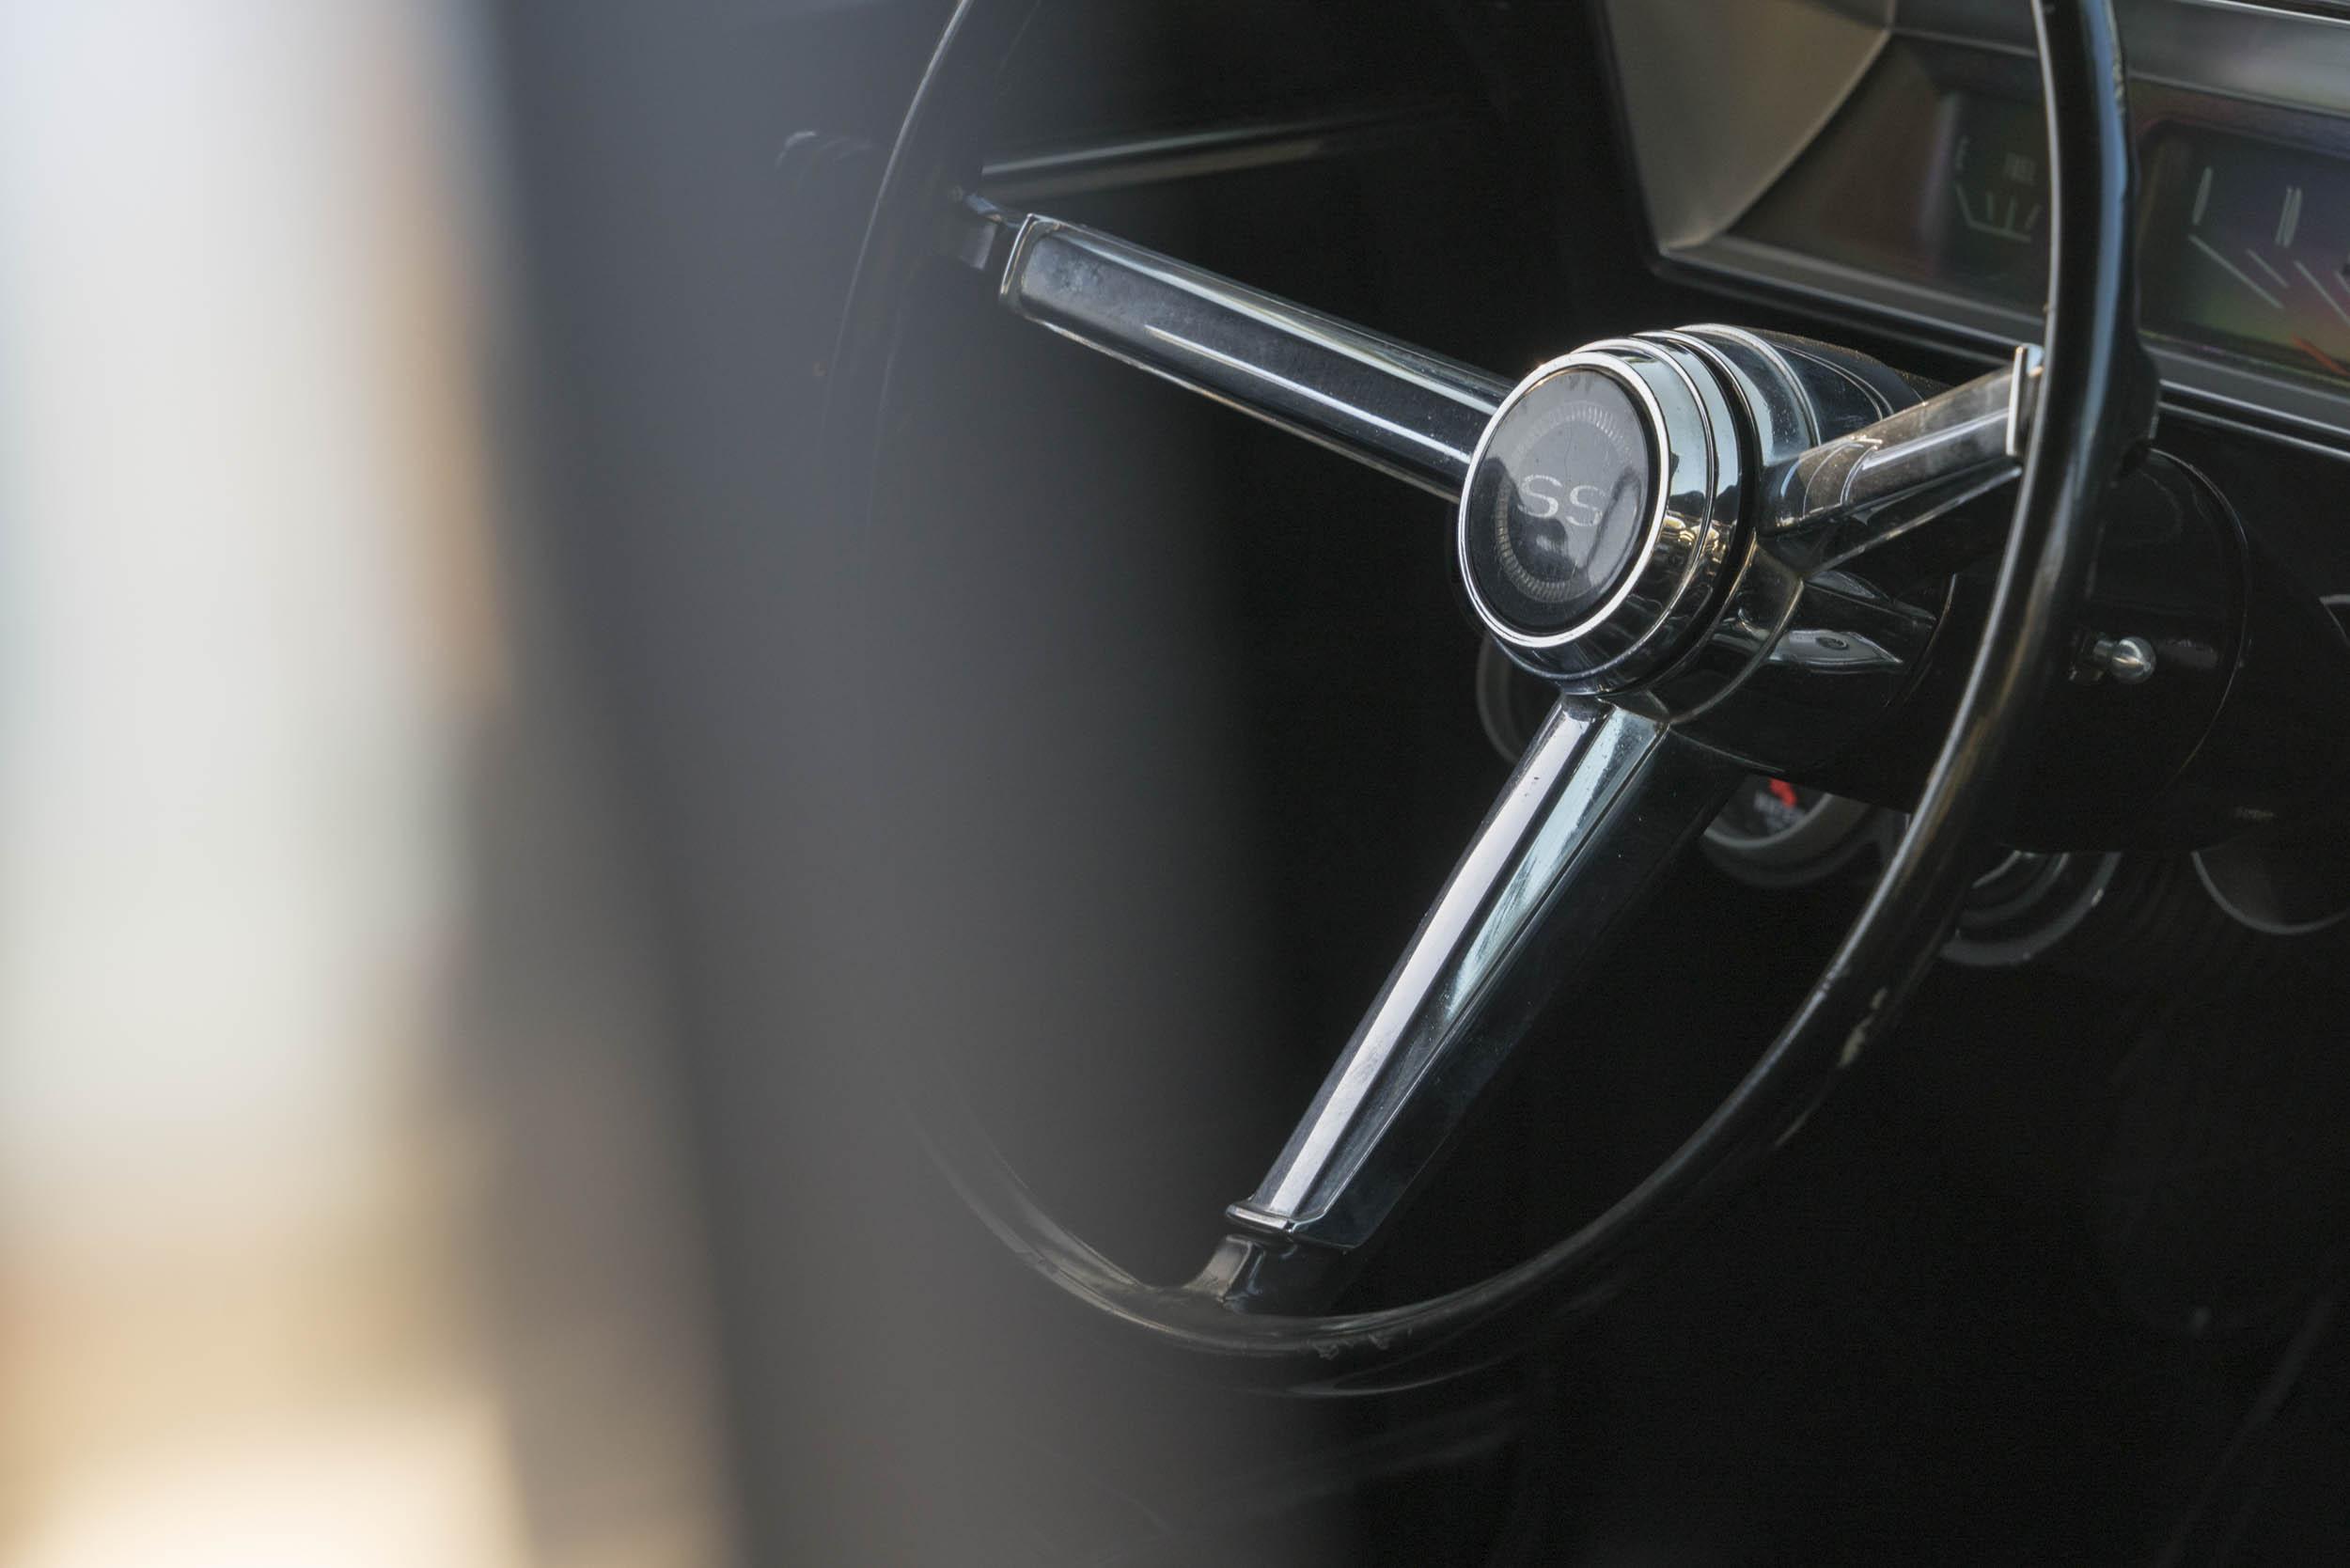 1967 Chevrolet Nova SS steering wheel